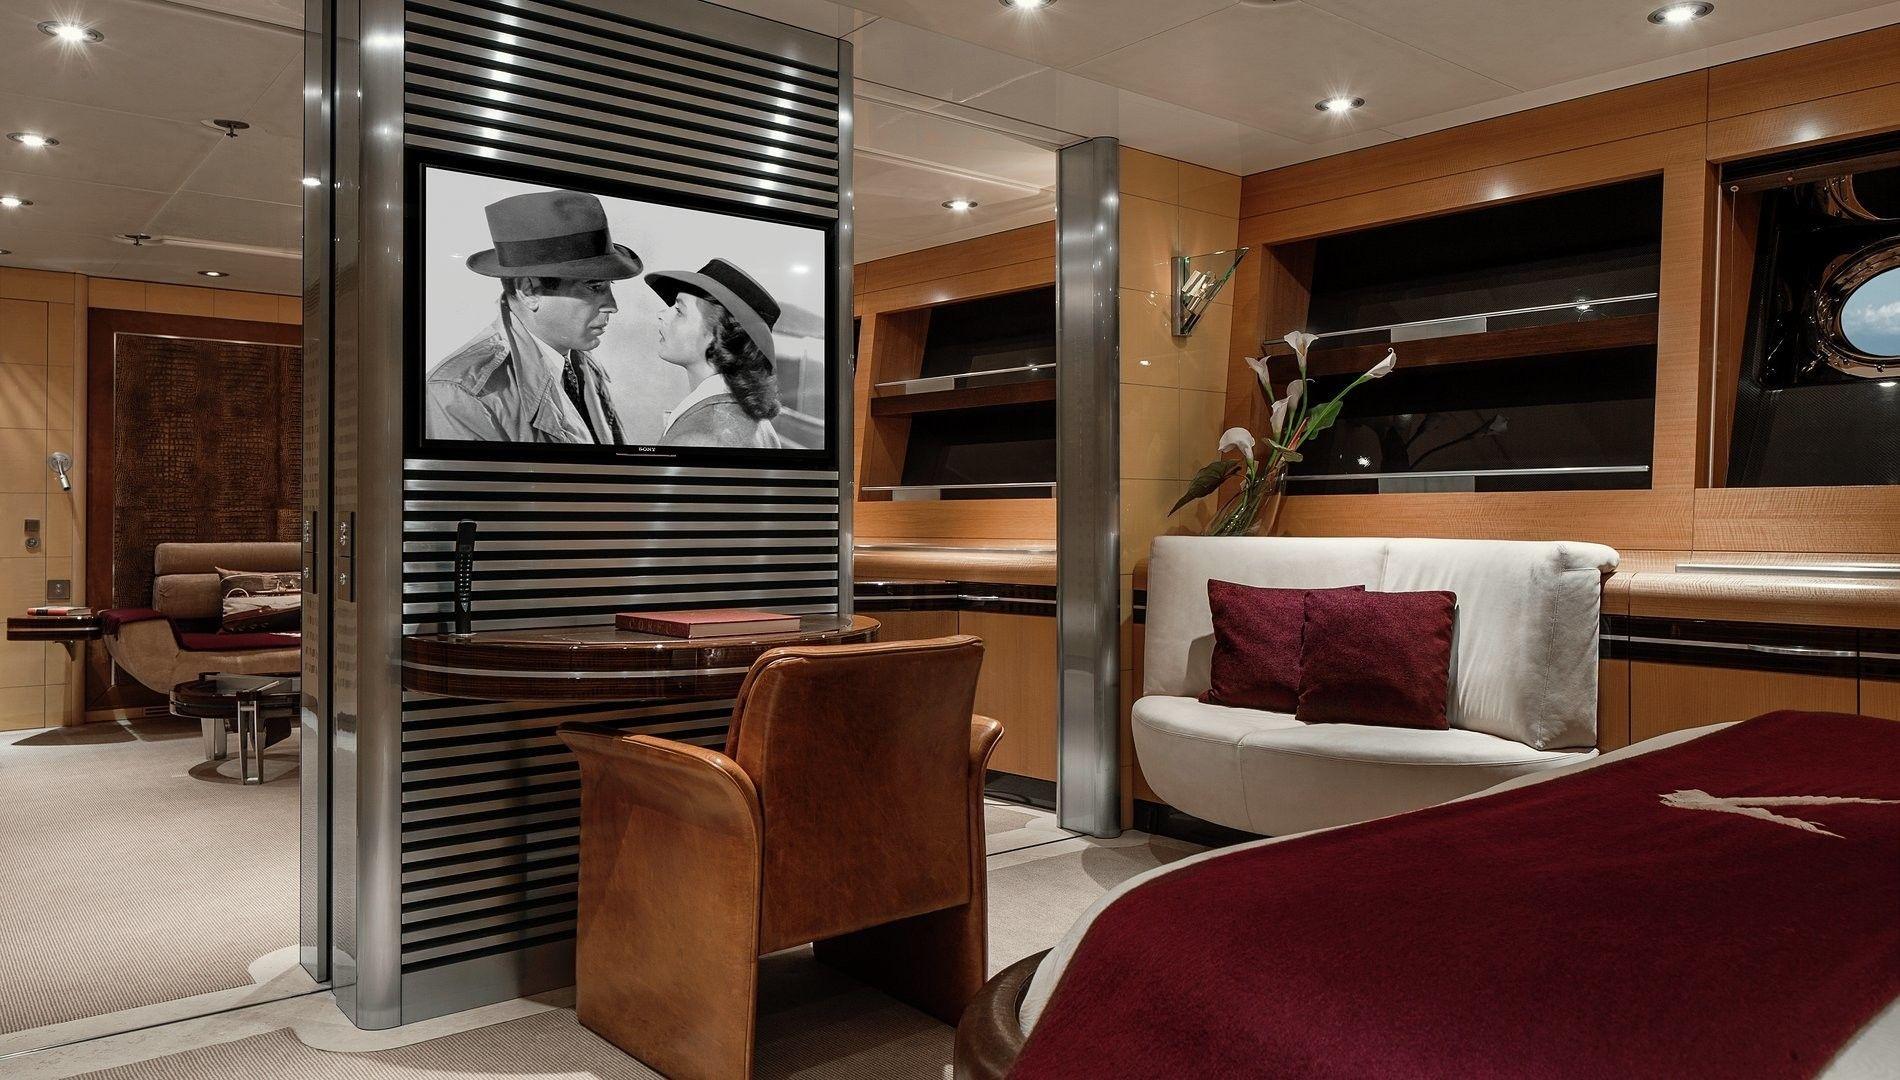 Yacht MALTESE FALCON Luxury yachts, Sailing yacht, Yacht